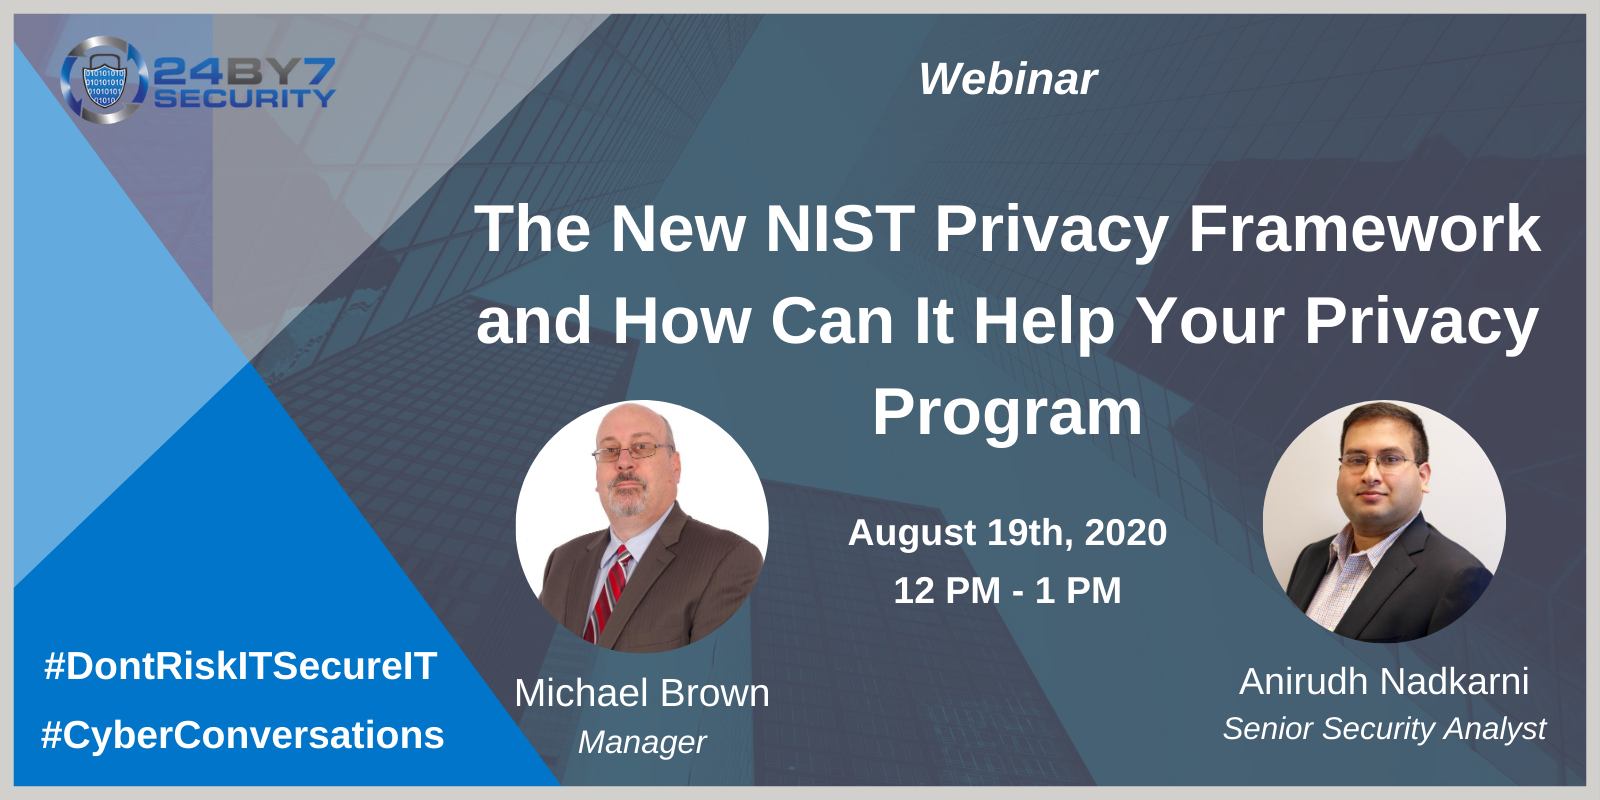 offers.24by7security.comhubfsNew NIST Privacy Framework, Web